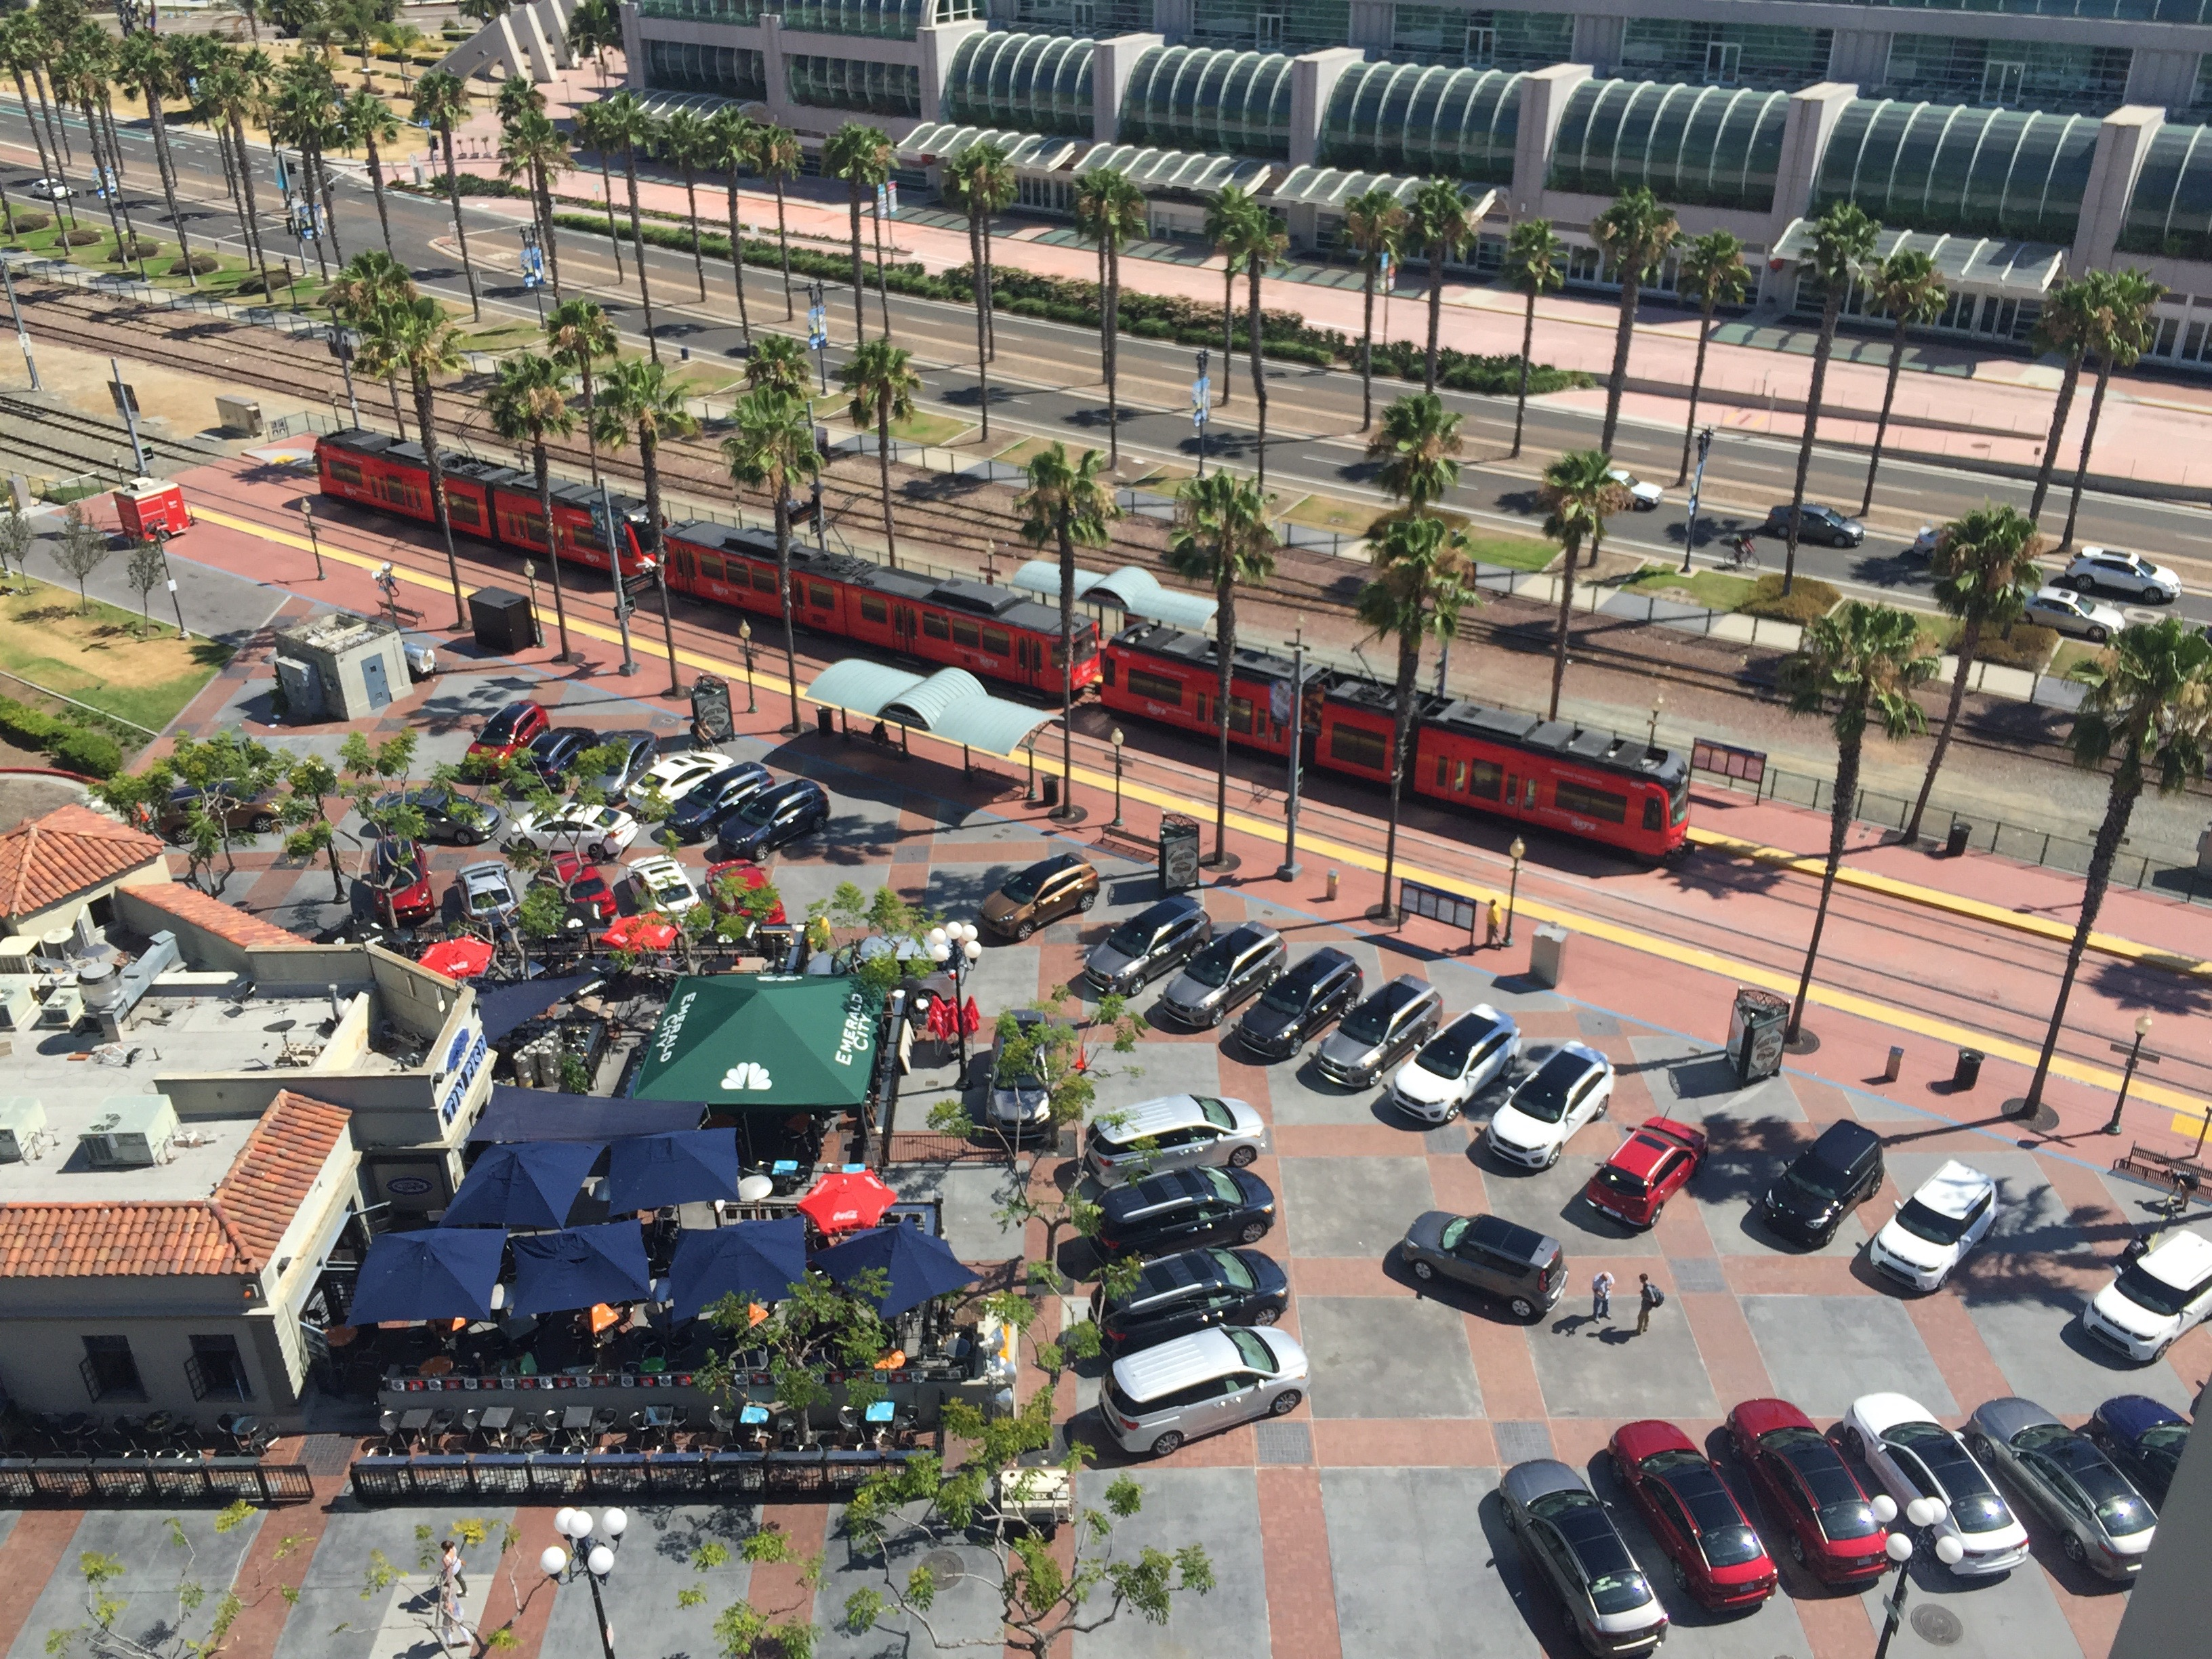 Kia Ride & Drive Event in San Diego